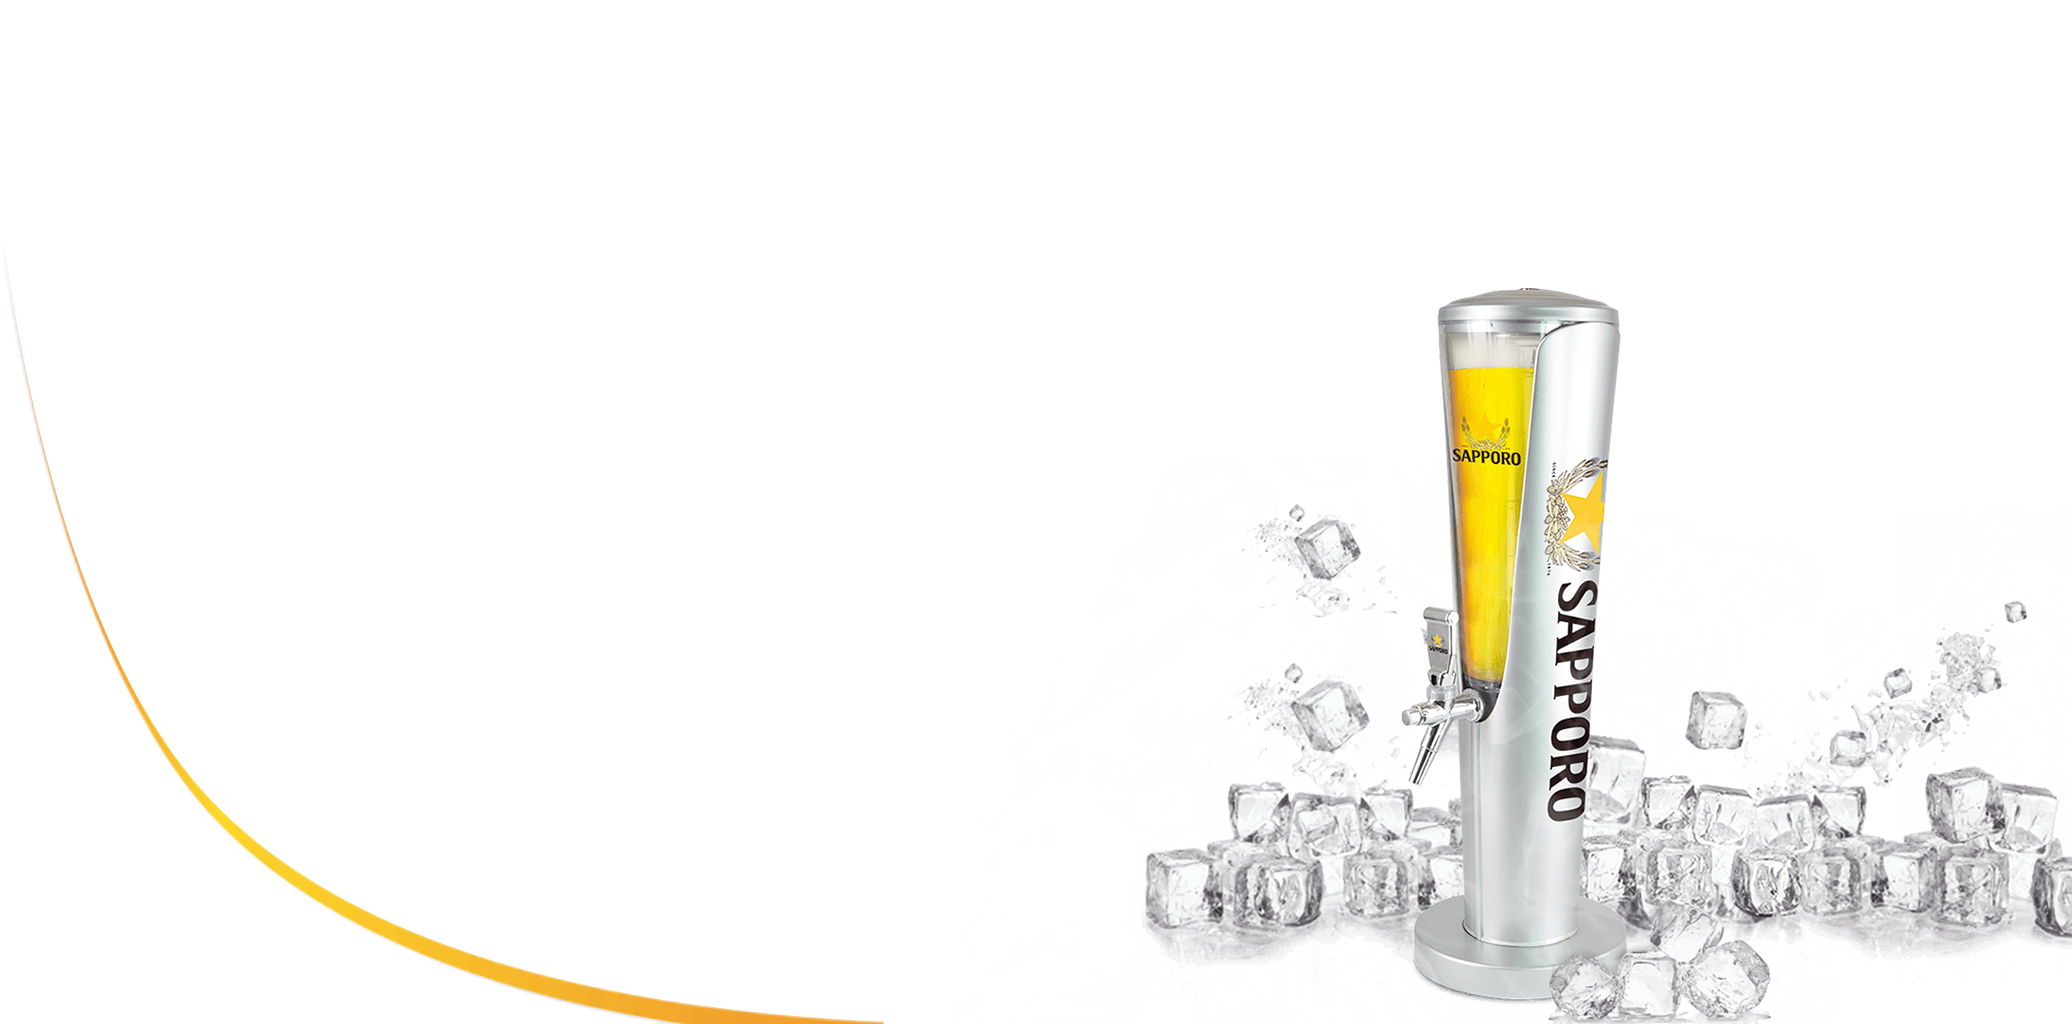 Bia tươi Sapporo Premium